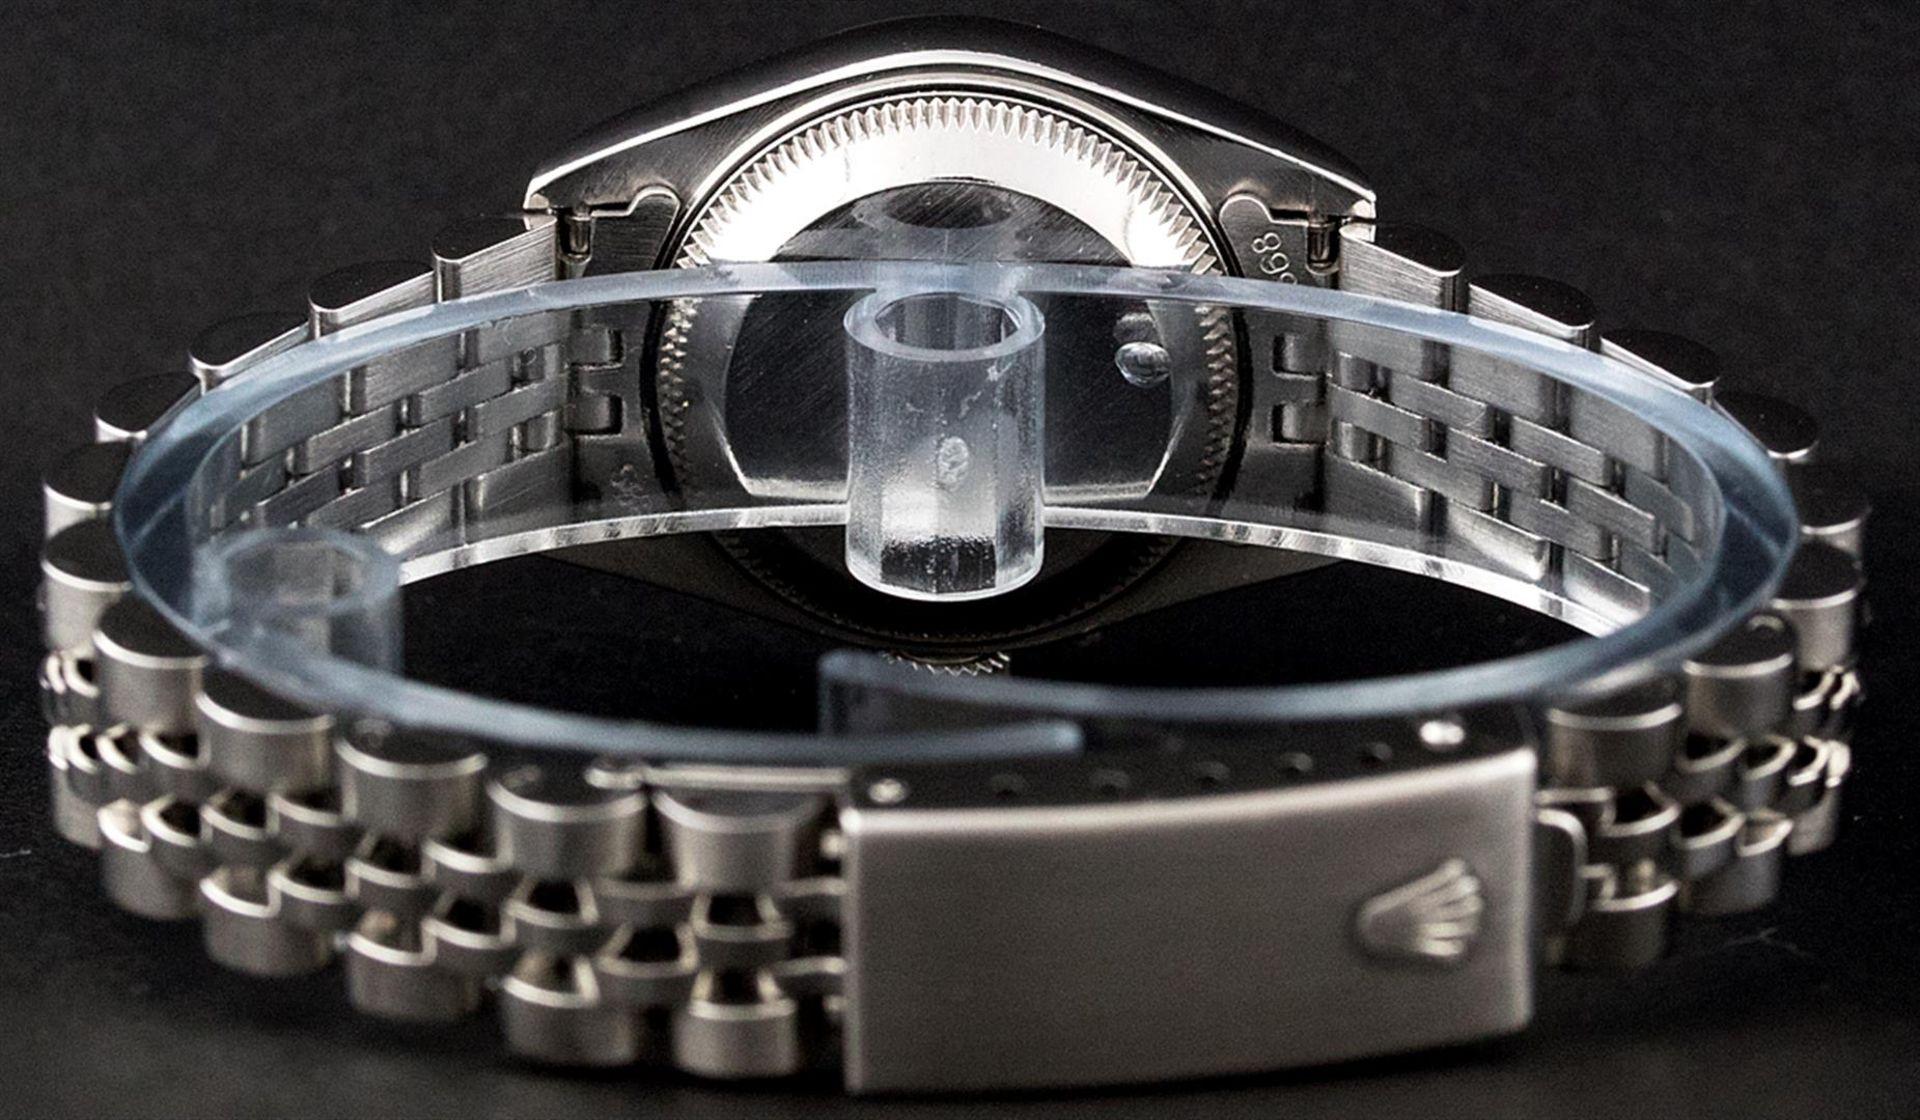 Rolex Ladies Stainless Steel Silver Index 26MM Quickset Datejust Wristwatch - Image 9 of 9